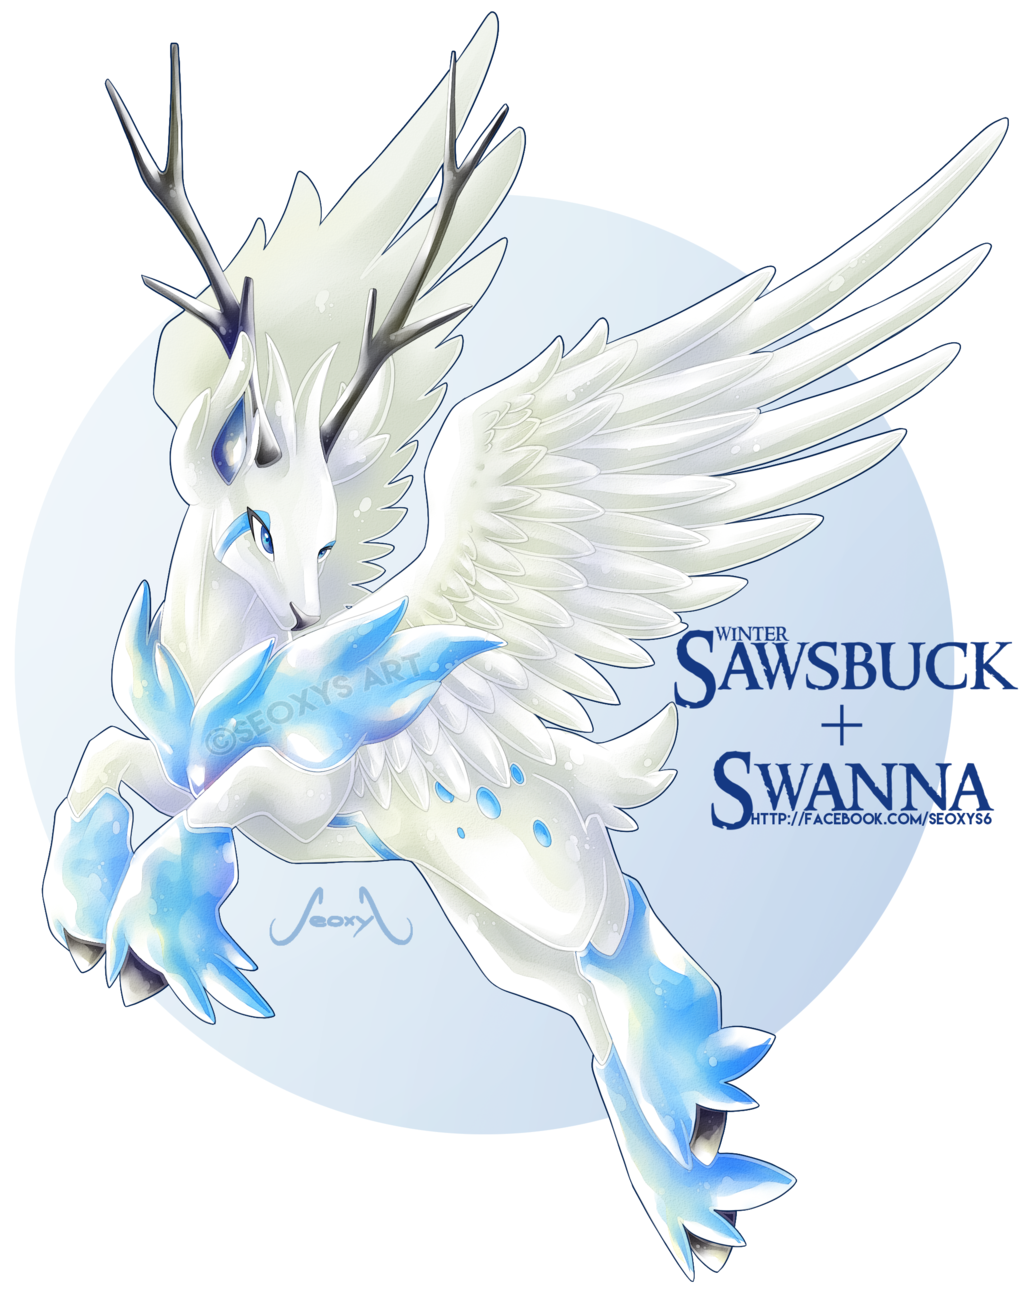 [Adopt] Winter Sawsbuck X Swanna [AUCTION] by Seoxys6.deviantart.com on @DeviantArt